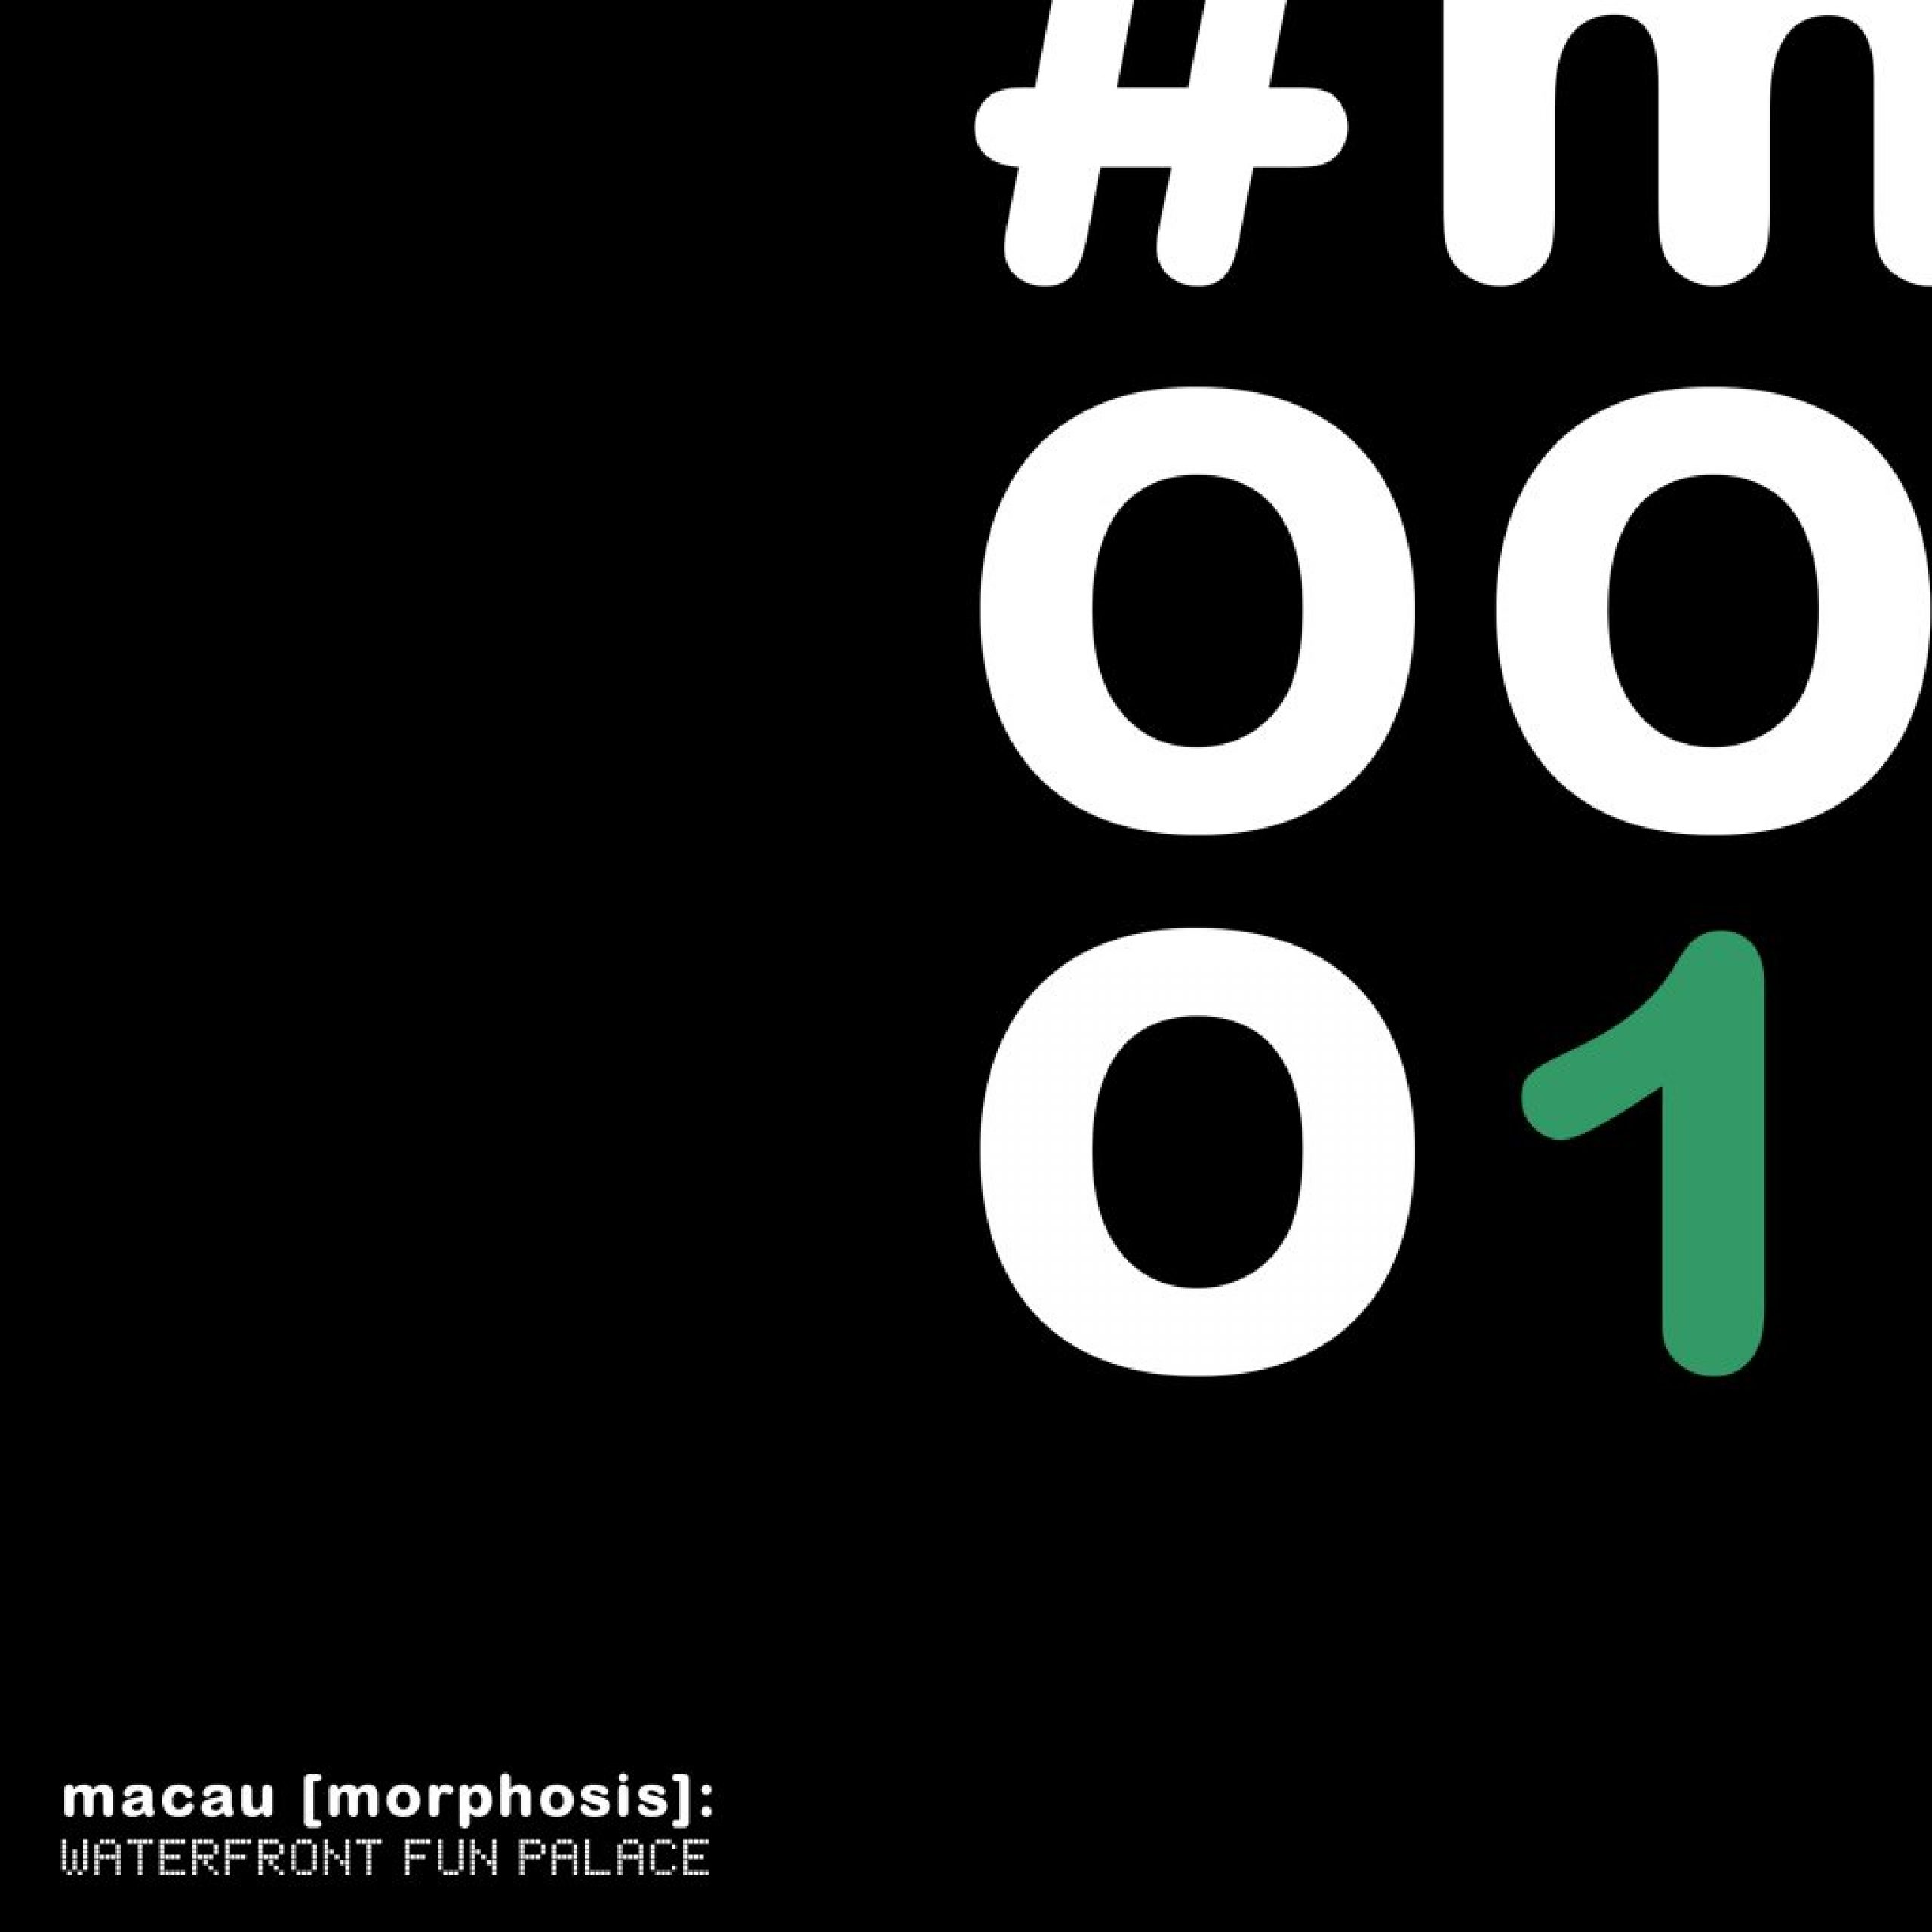 mooo1 draft publication cover 2